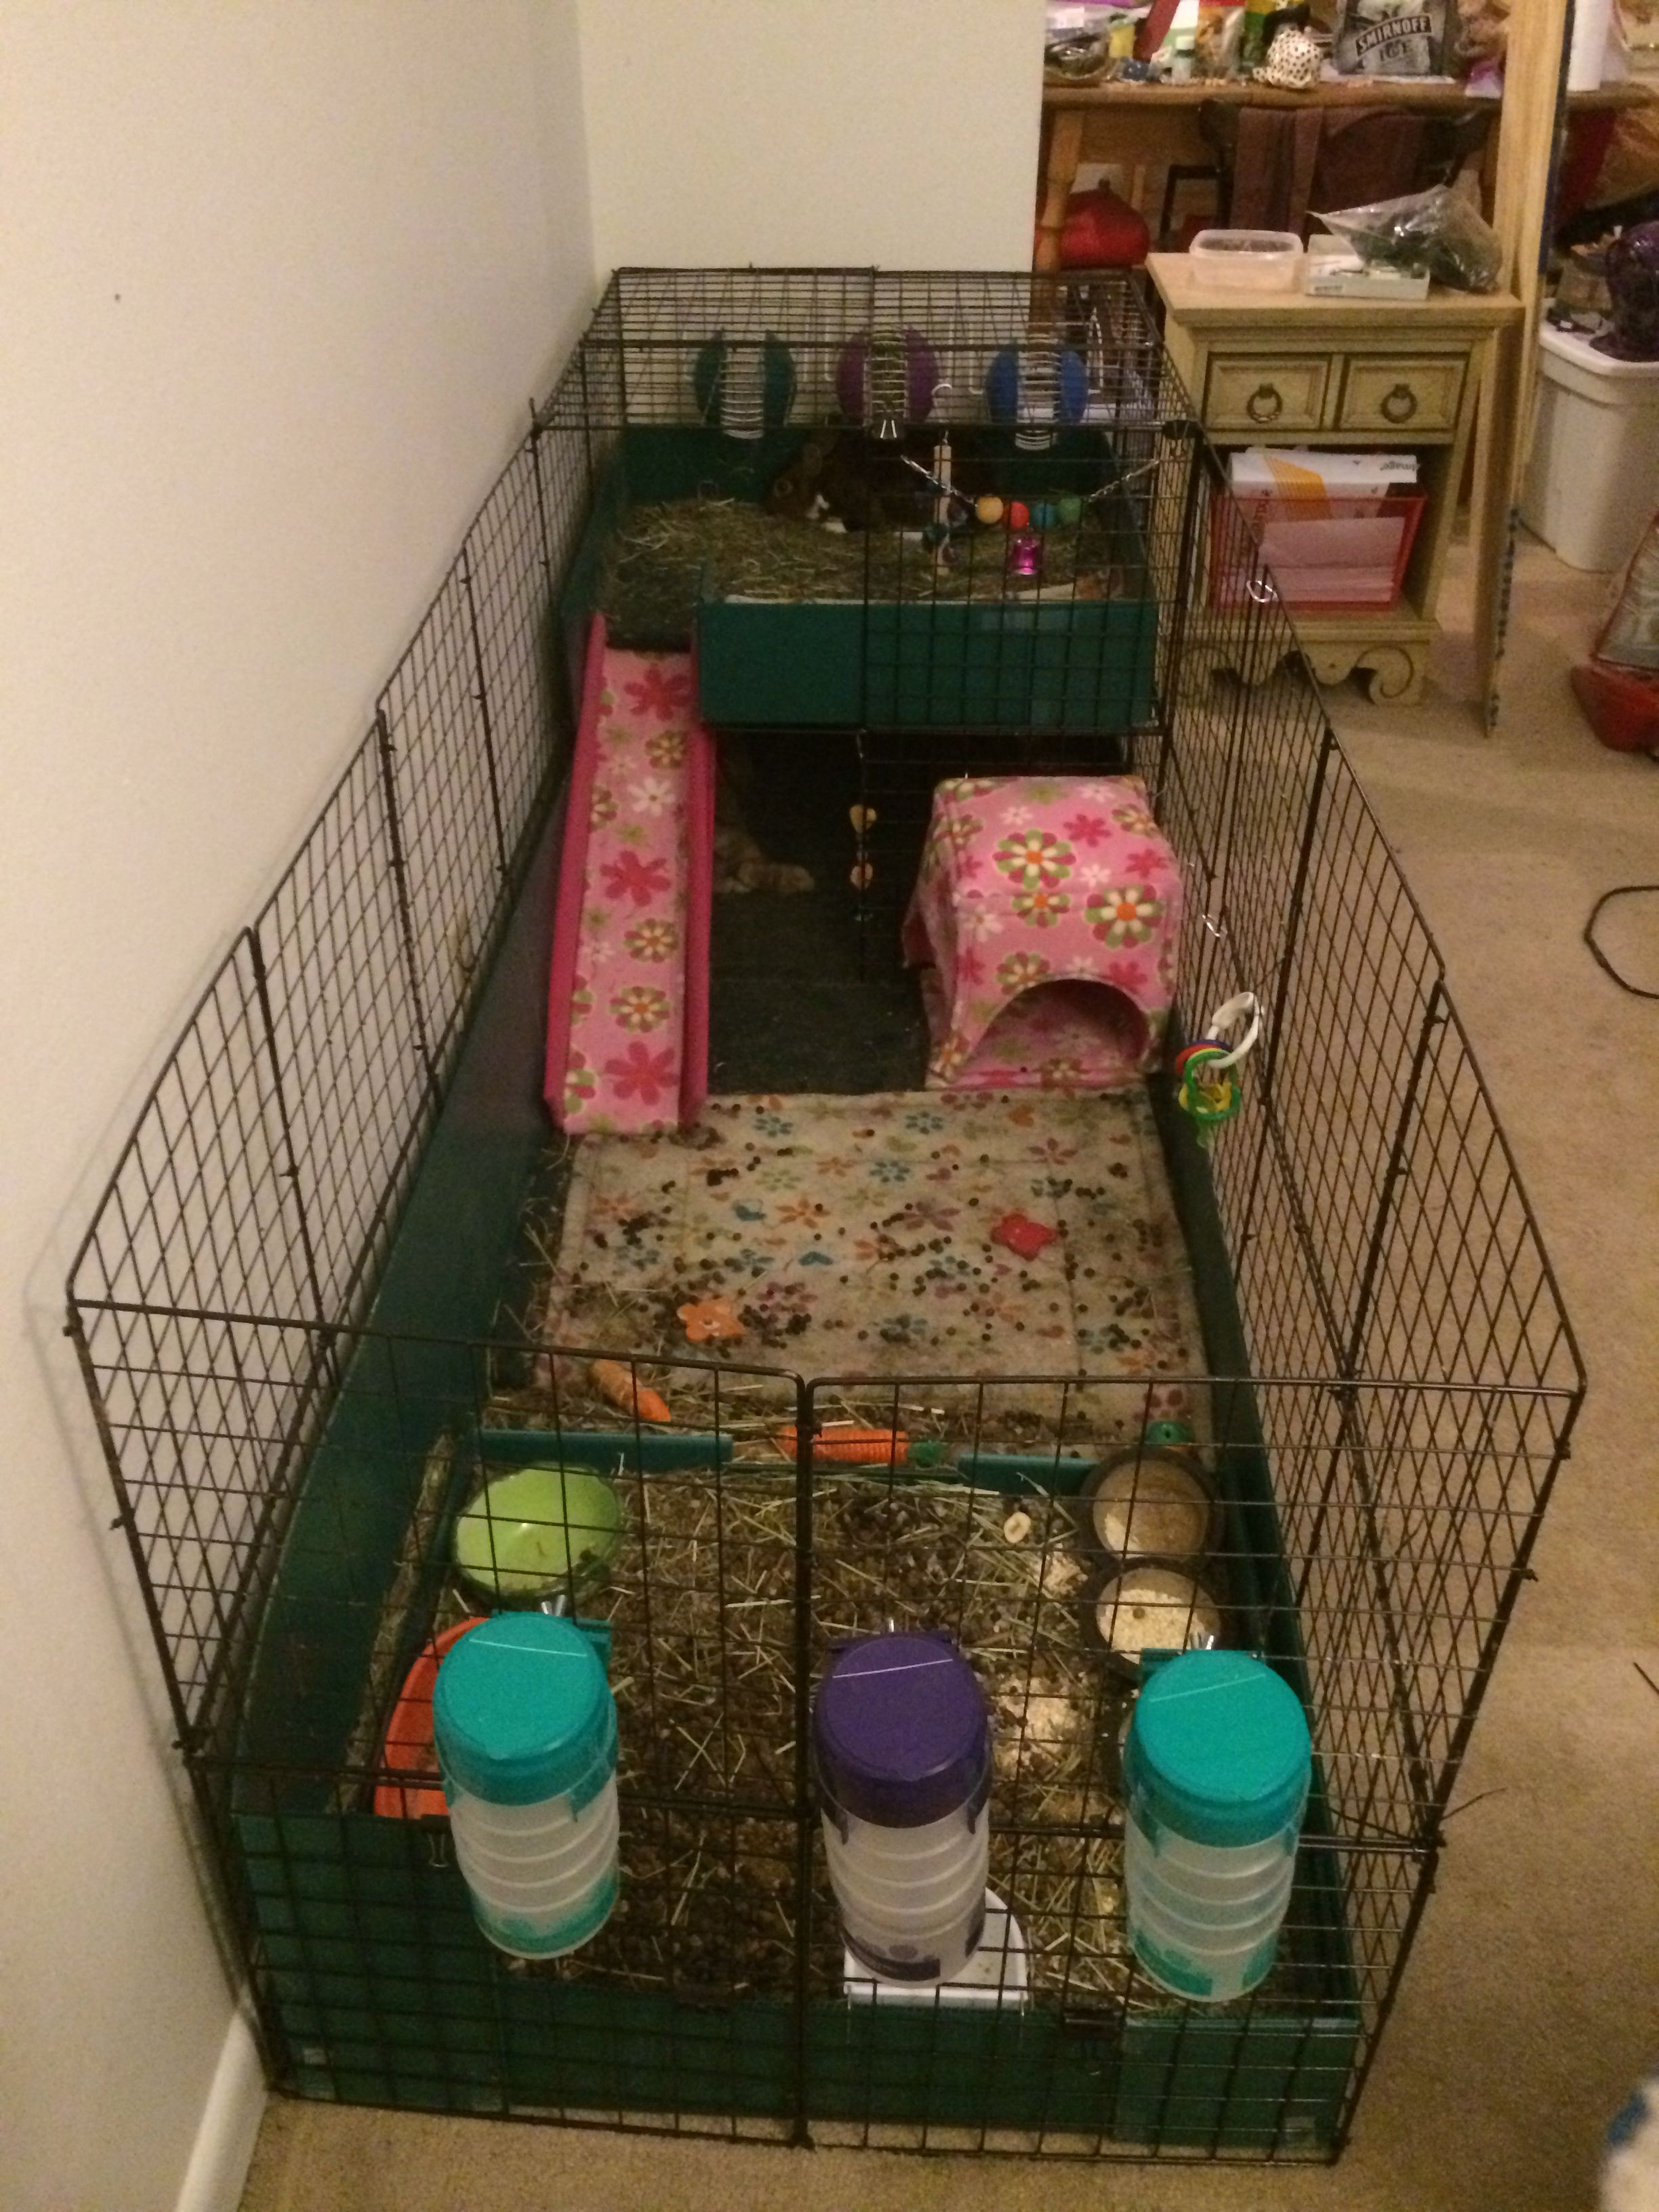 Pin By Rachel Adams On Rabbit Cage Indoor Rabbit Rabbit Cage Bunny Cages